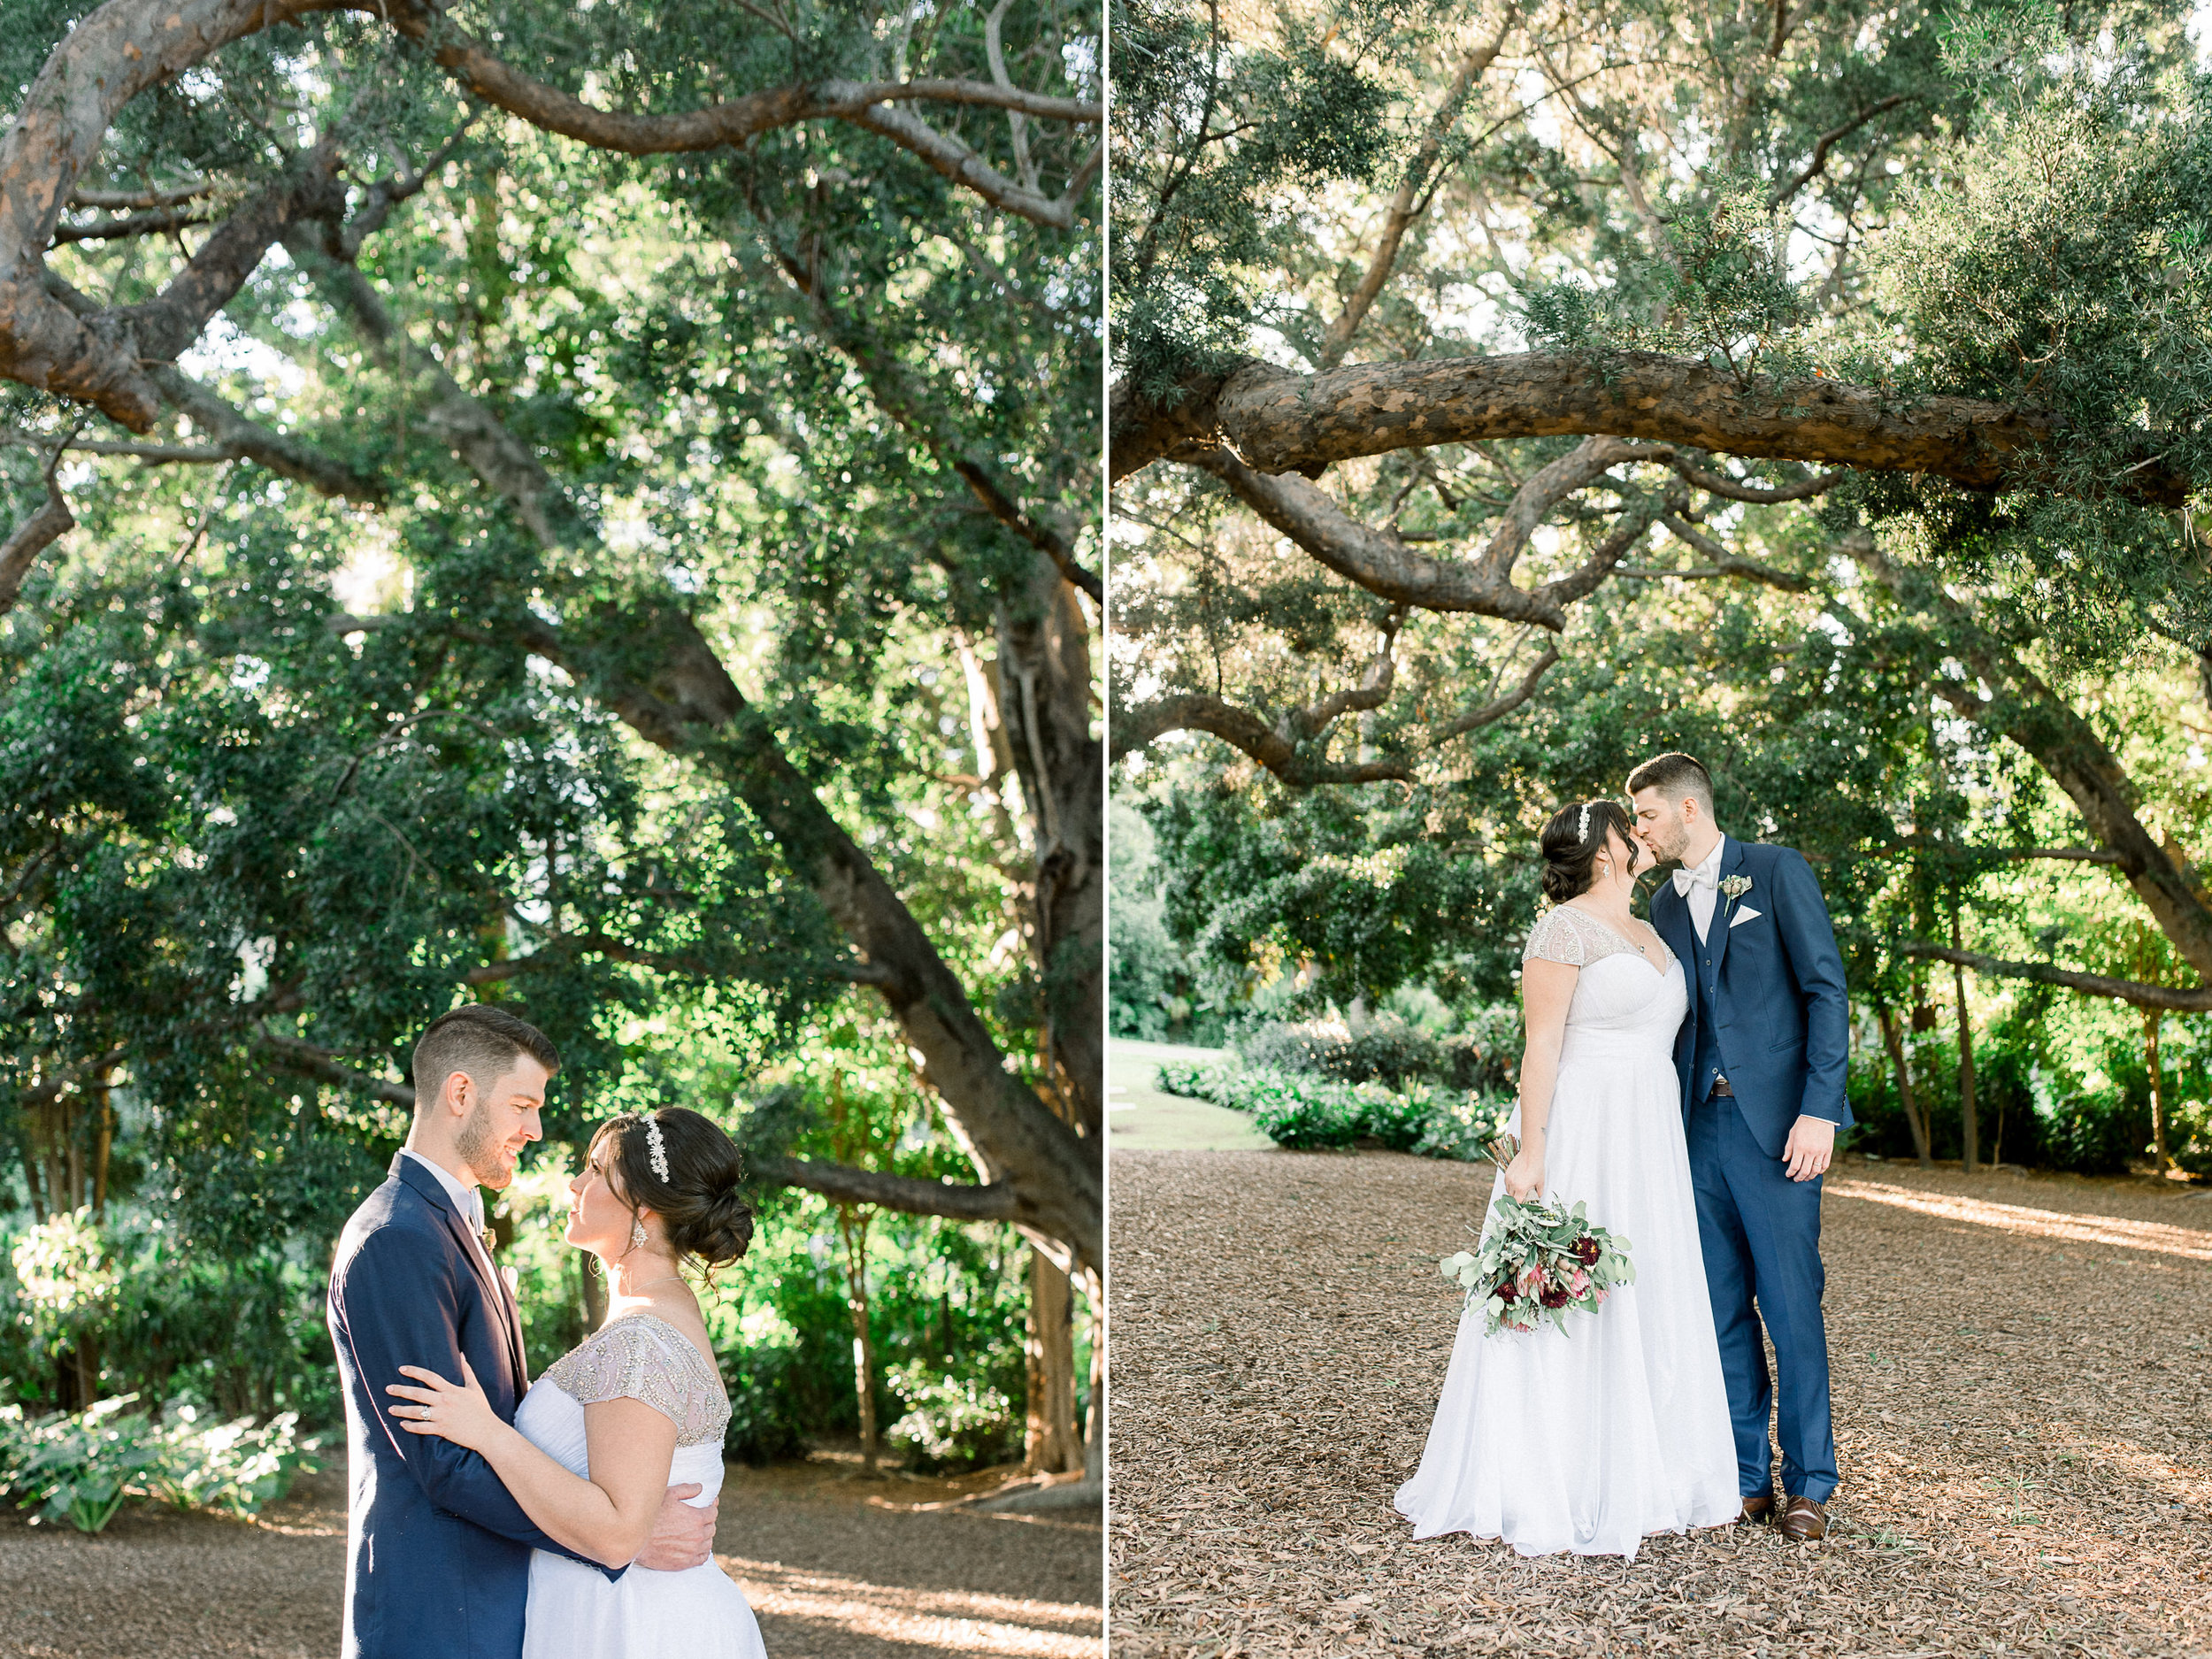 brisbane-city-wedding-photography-botanical-gardens-bridal-5.jpg